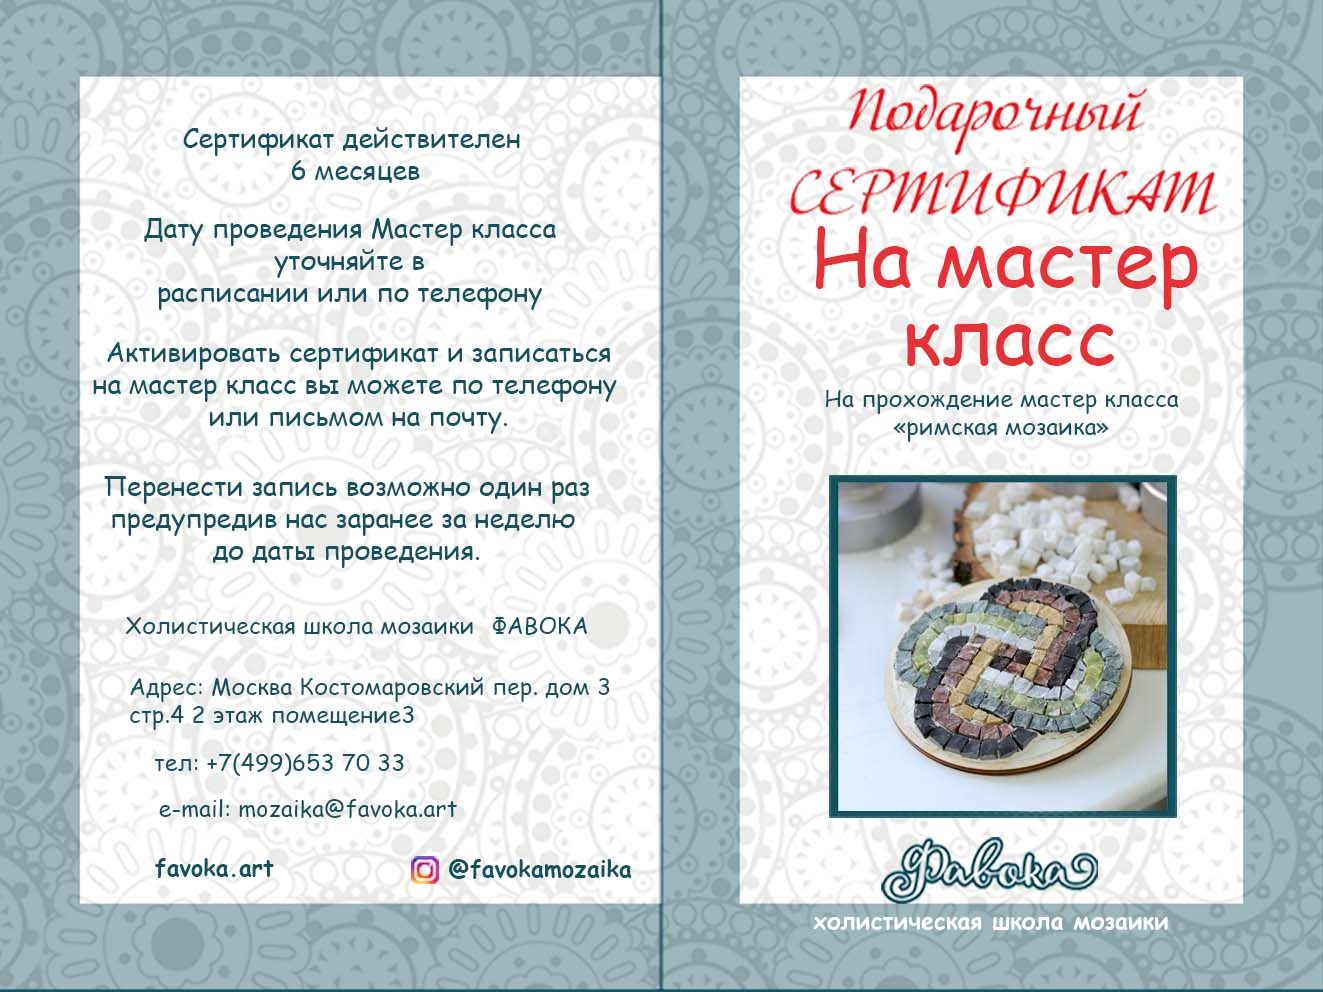 Пример сертификата на мастер-класс мозаики